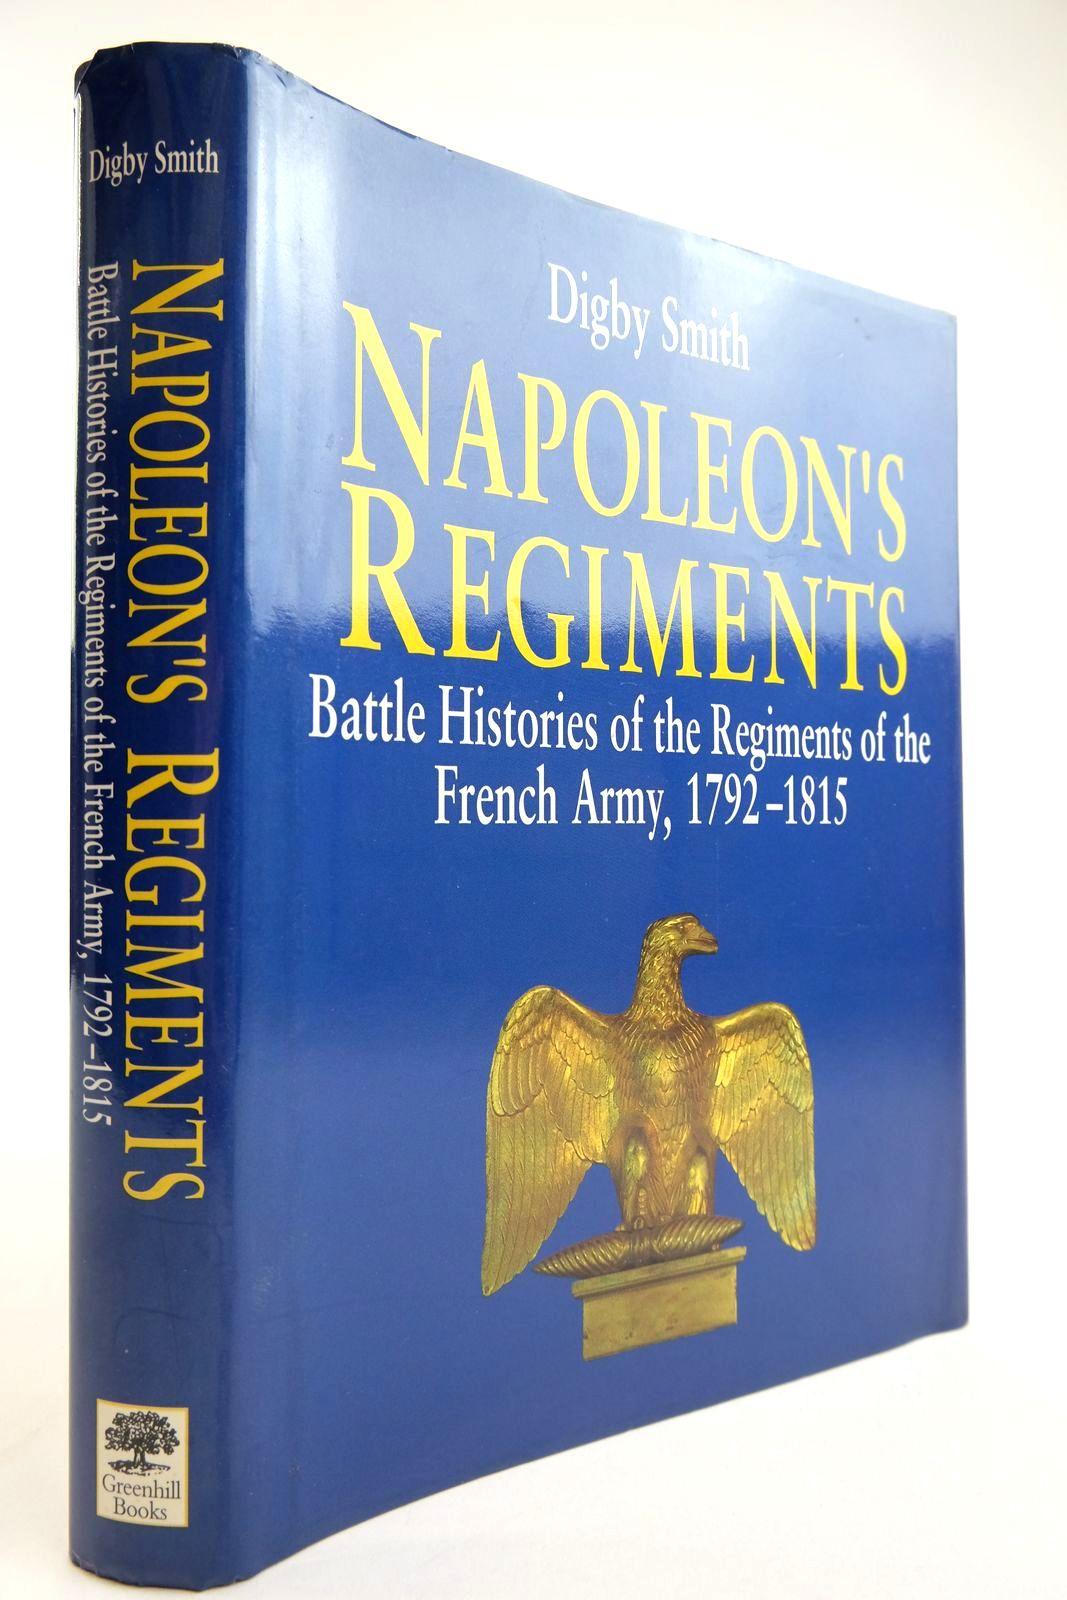 Photo of NAPOLEON'S REGIMENTS- Stock Number: 2134163